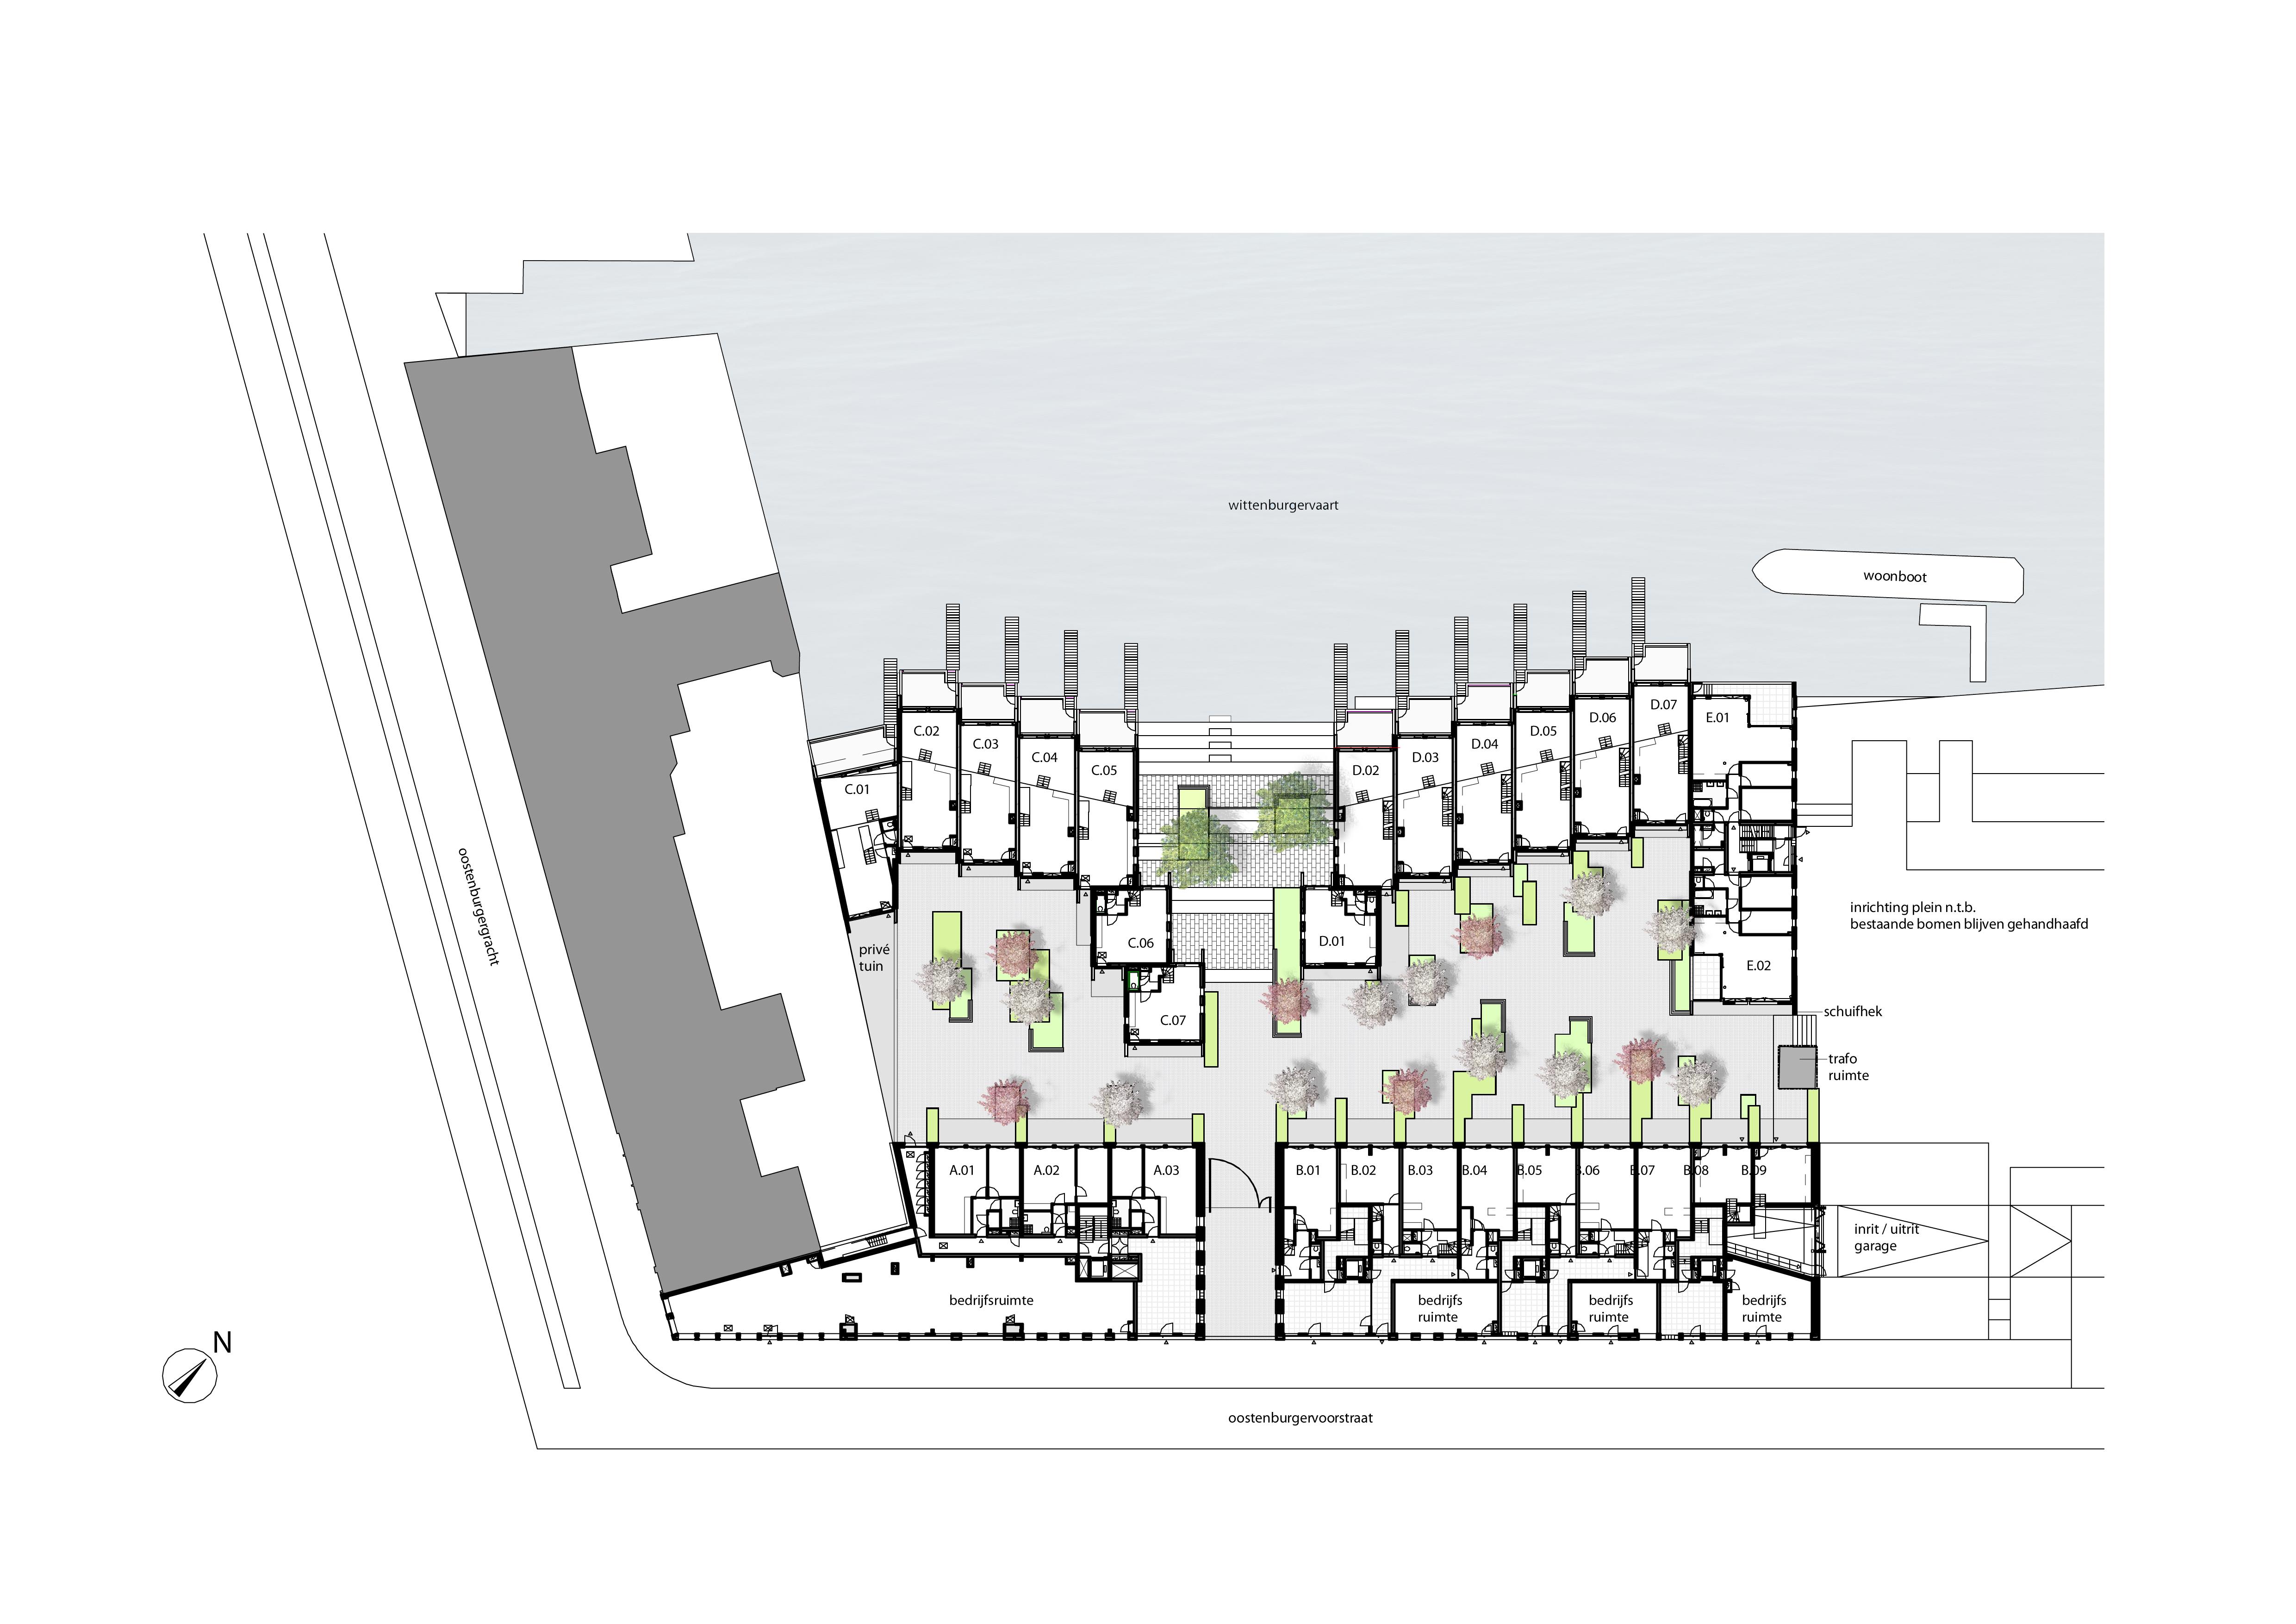 <p>beeld: Arons &#038; Gelauff architecten</p>